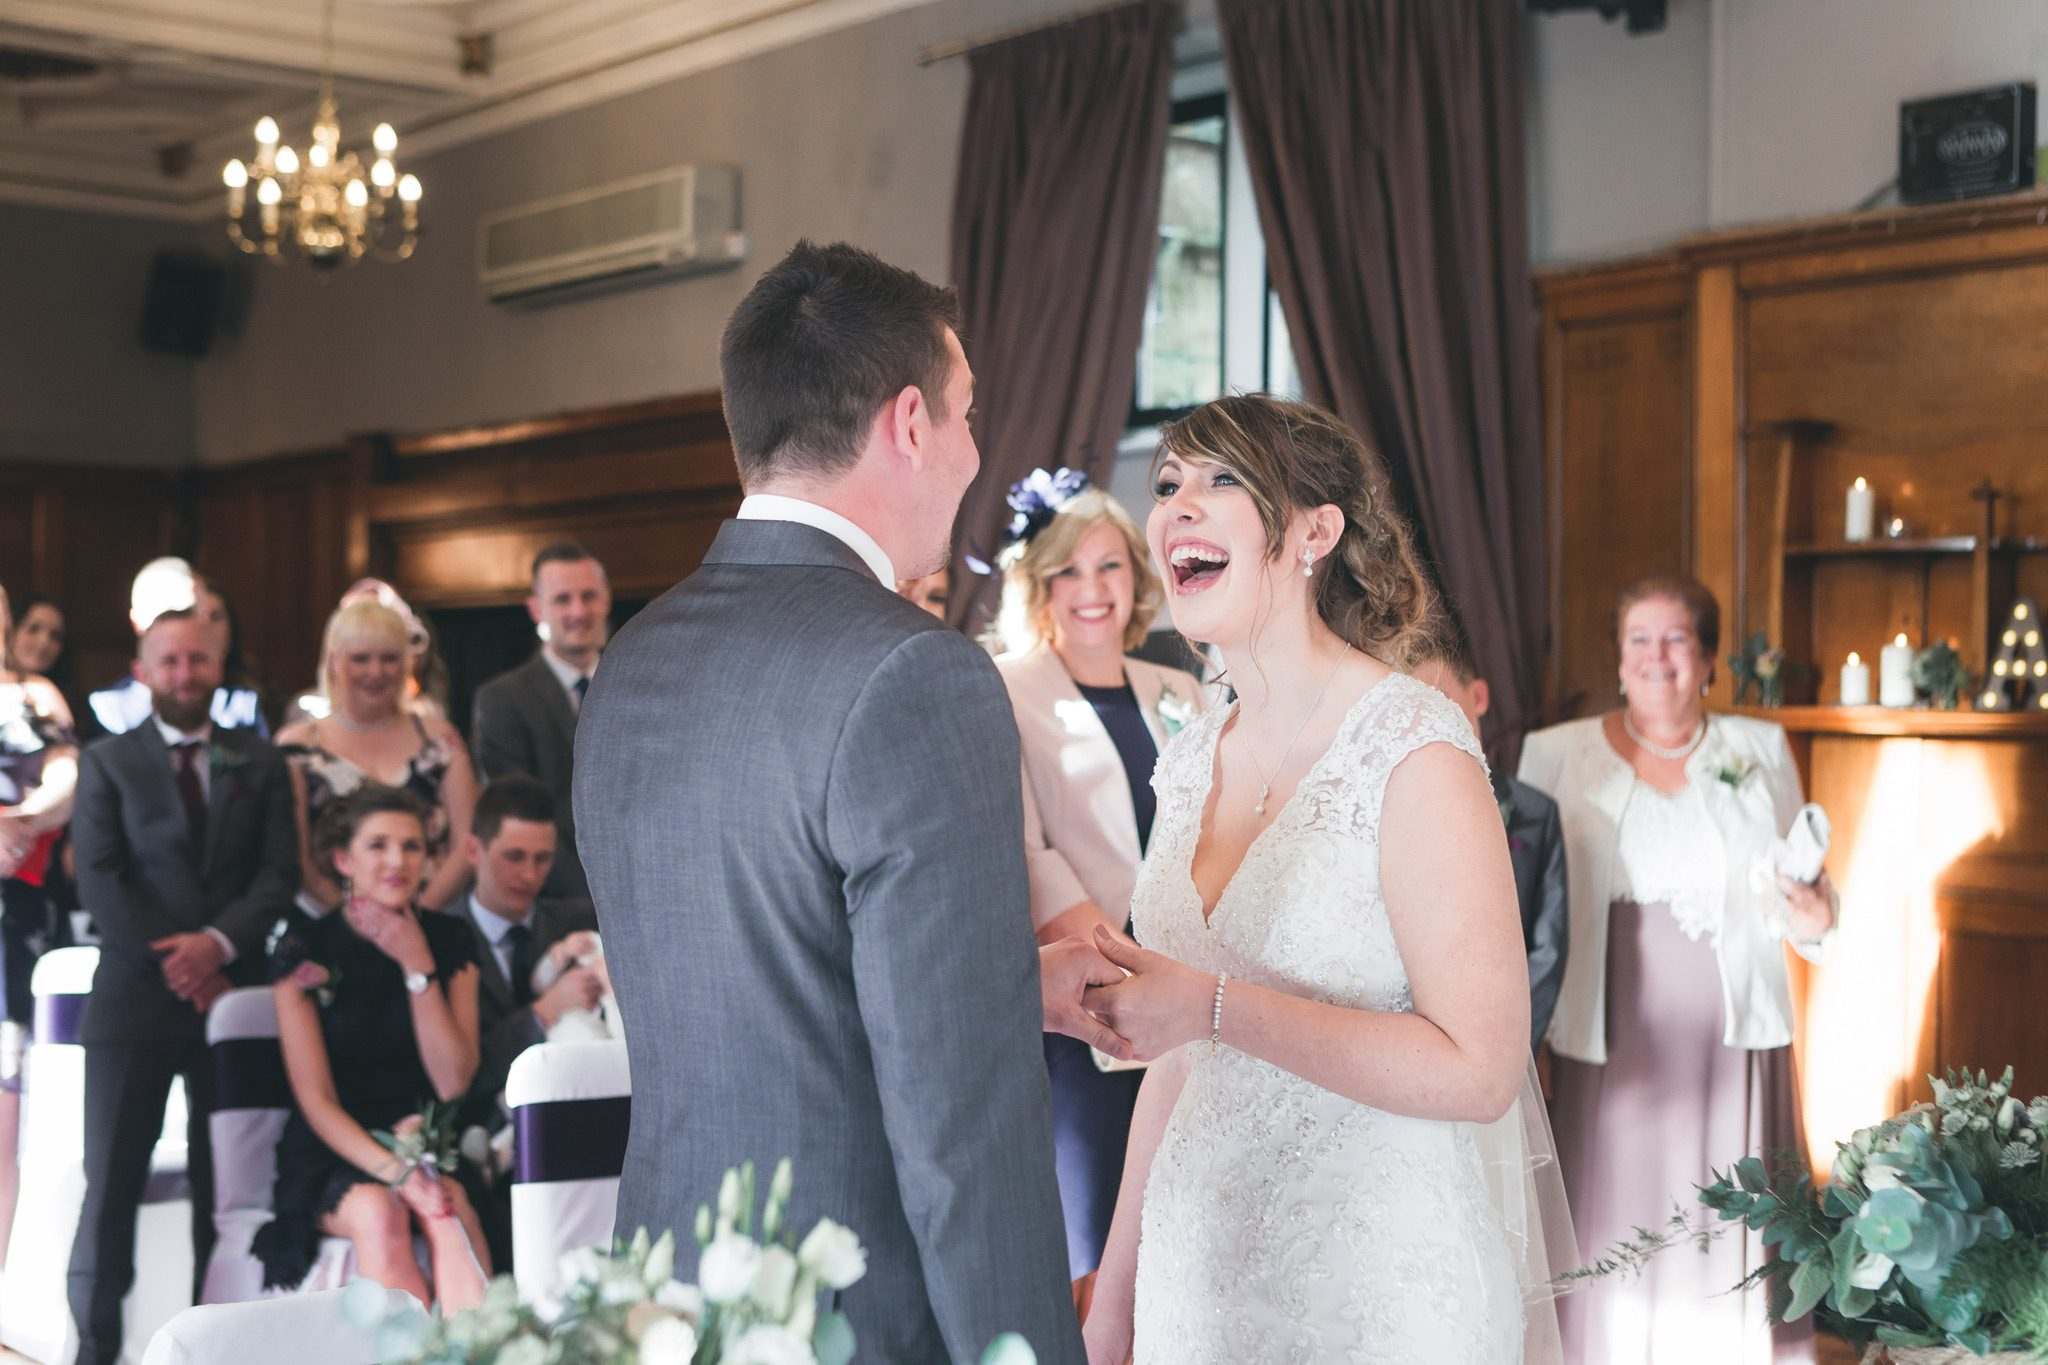 Derbyshire Wedding Photographer - The Maynard